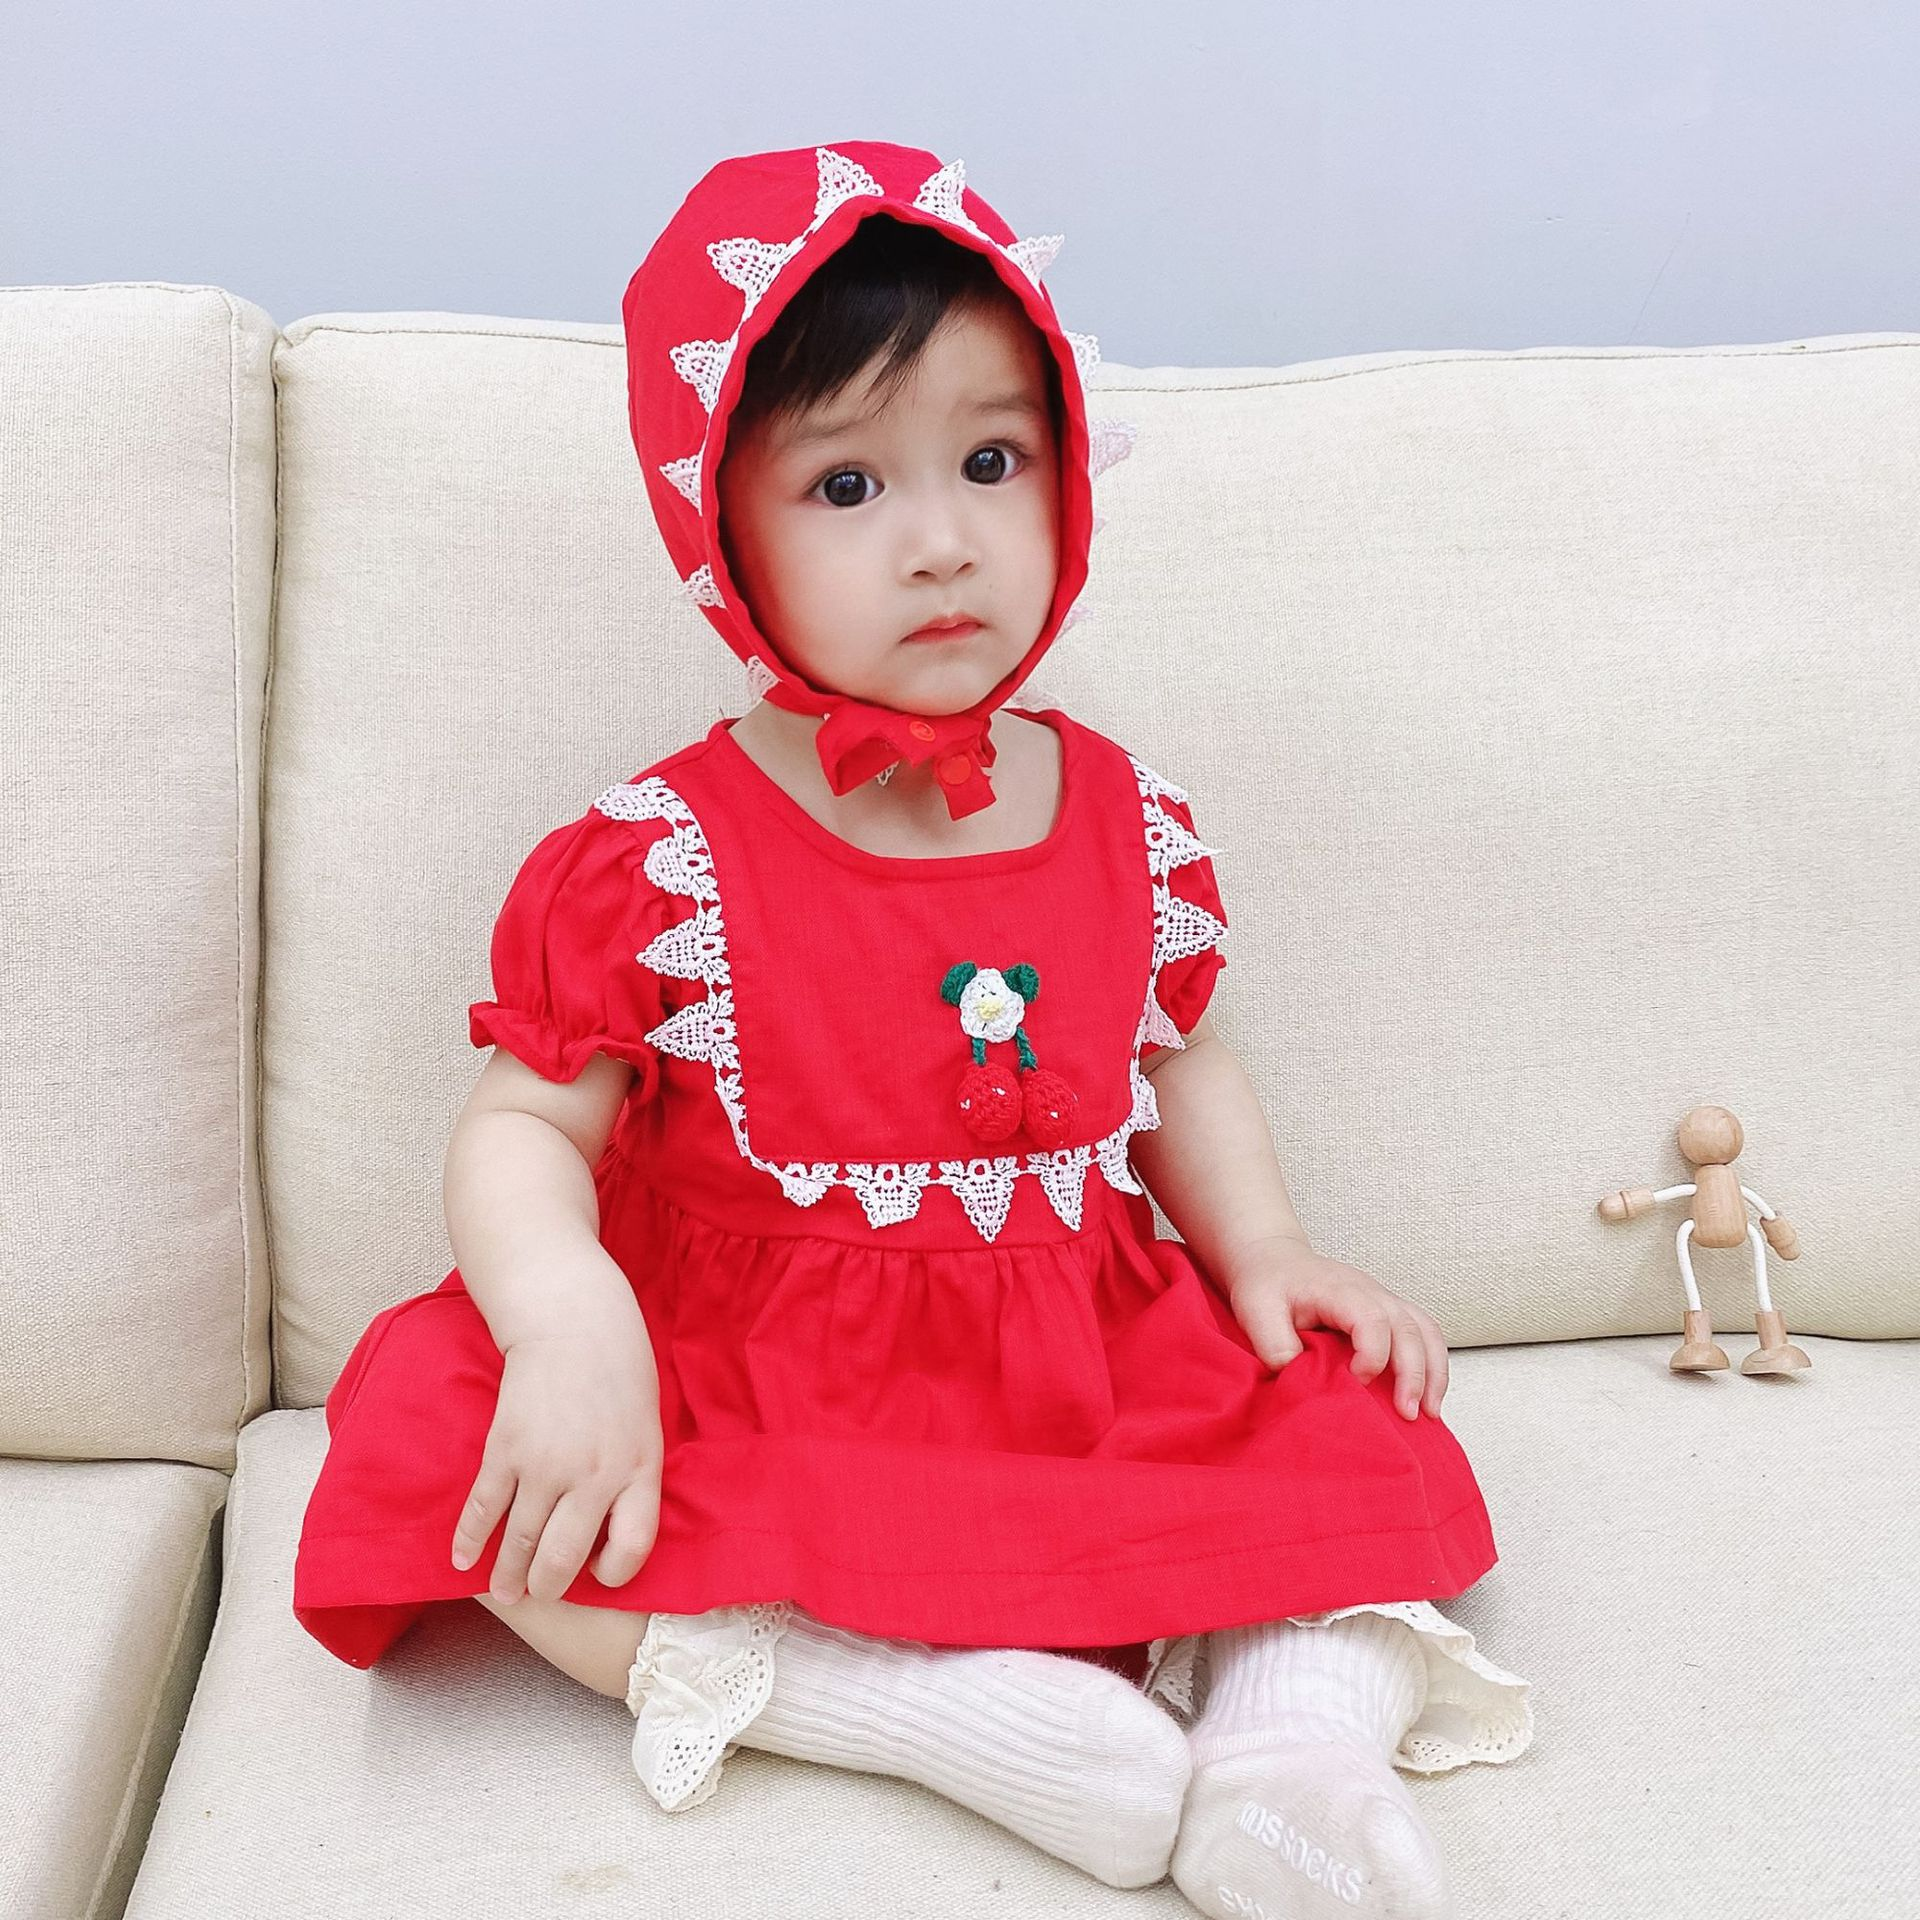 Yg brand children's clothing summer new lace princess skirt elastic waist dress send HAT baby girl s